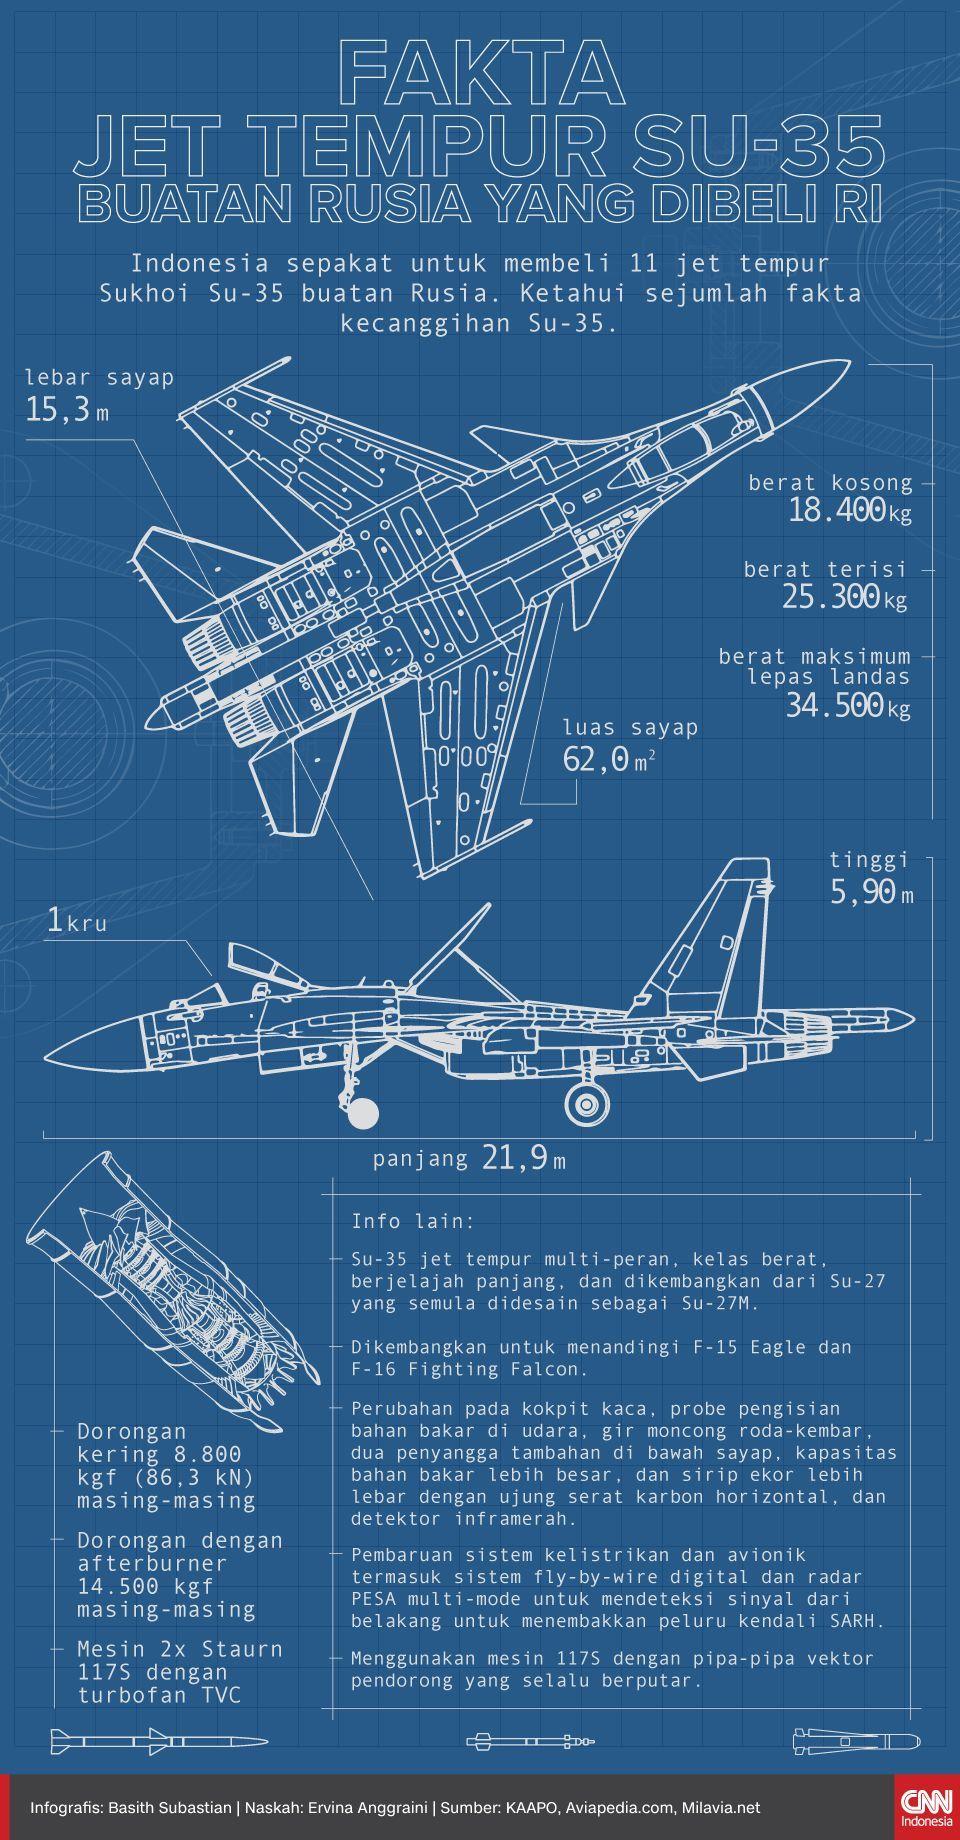 Infografis Fakta Jet Tempur Su-35 Buatan Rusia yang Dibeli RI